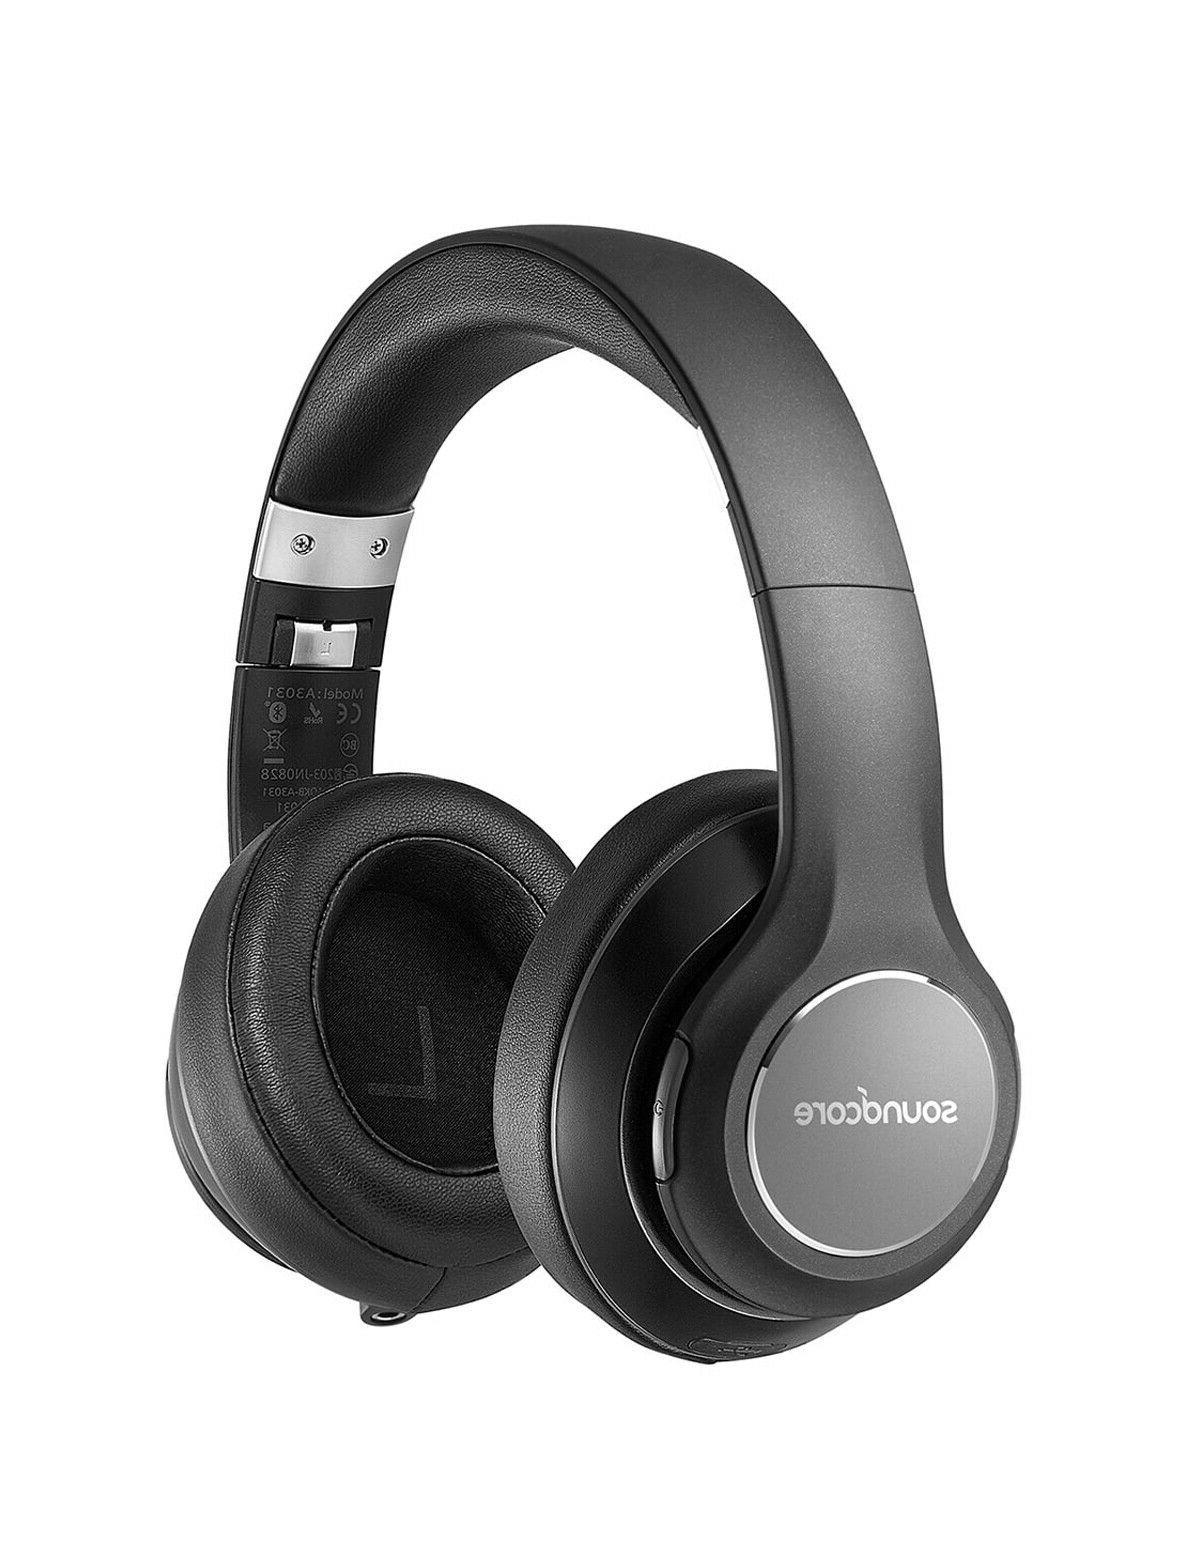 soundcore by vortex wireless over ear headphones